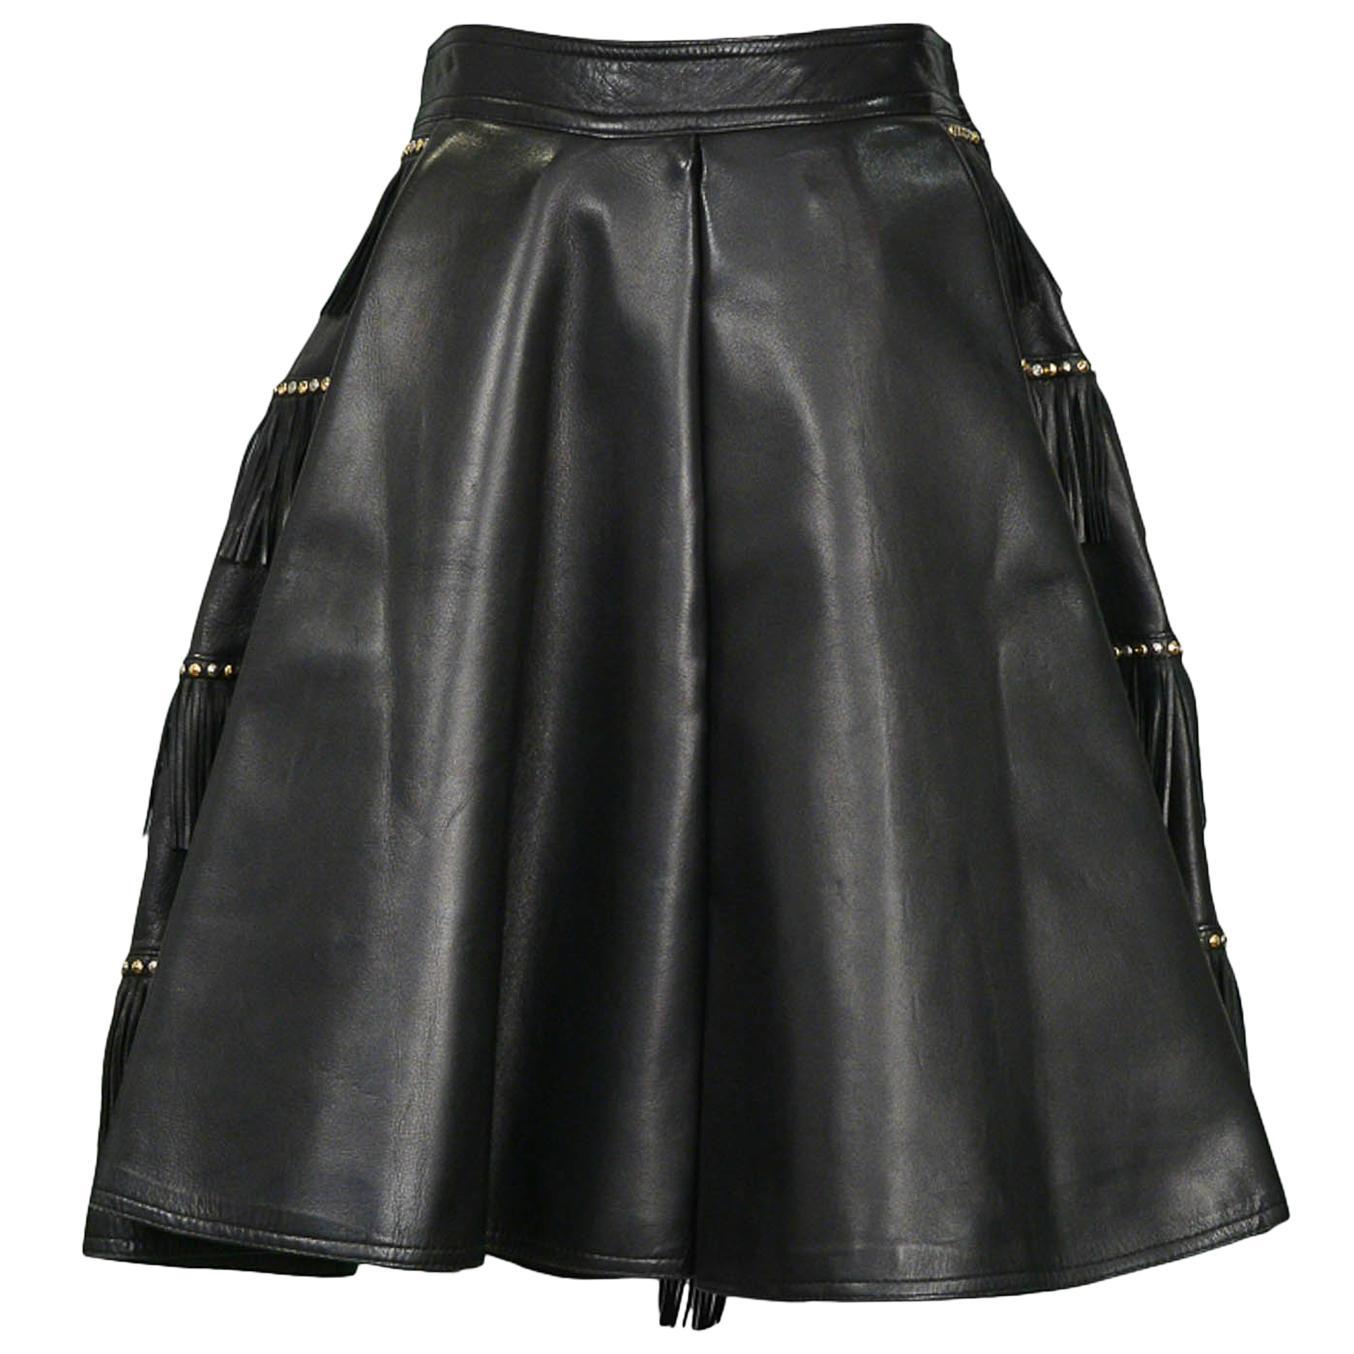 Vintage Gianni Versace Black Leather Fringe Studded Skirt AW 1992